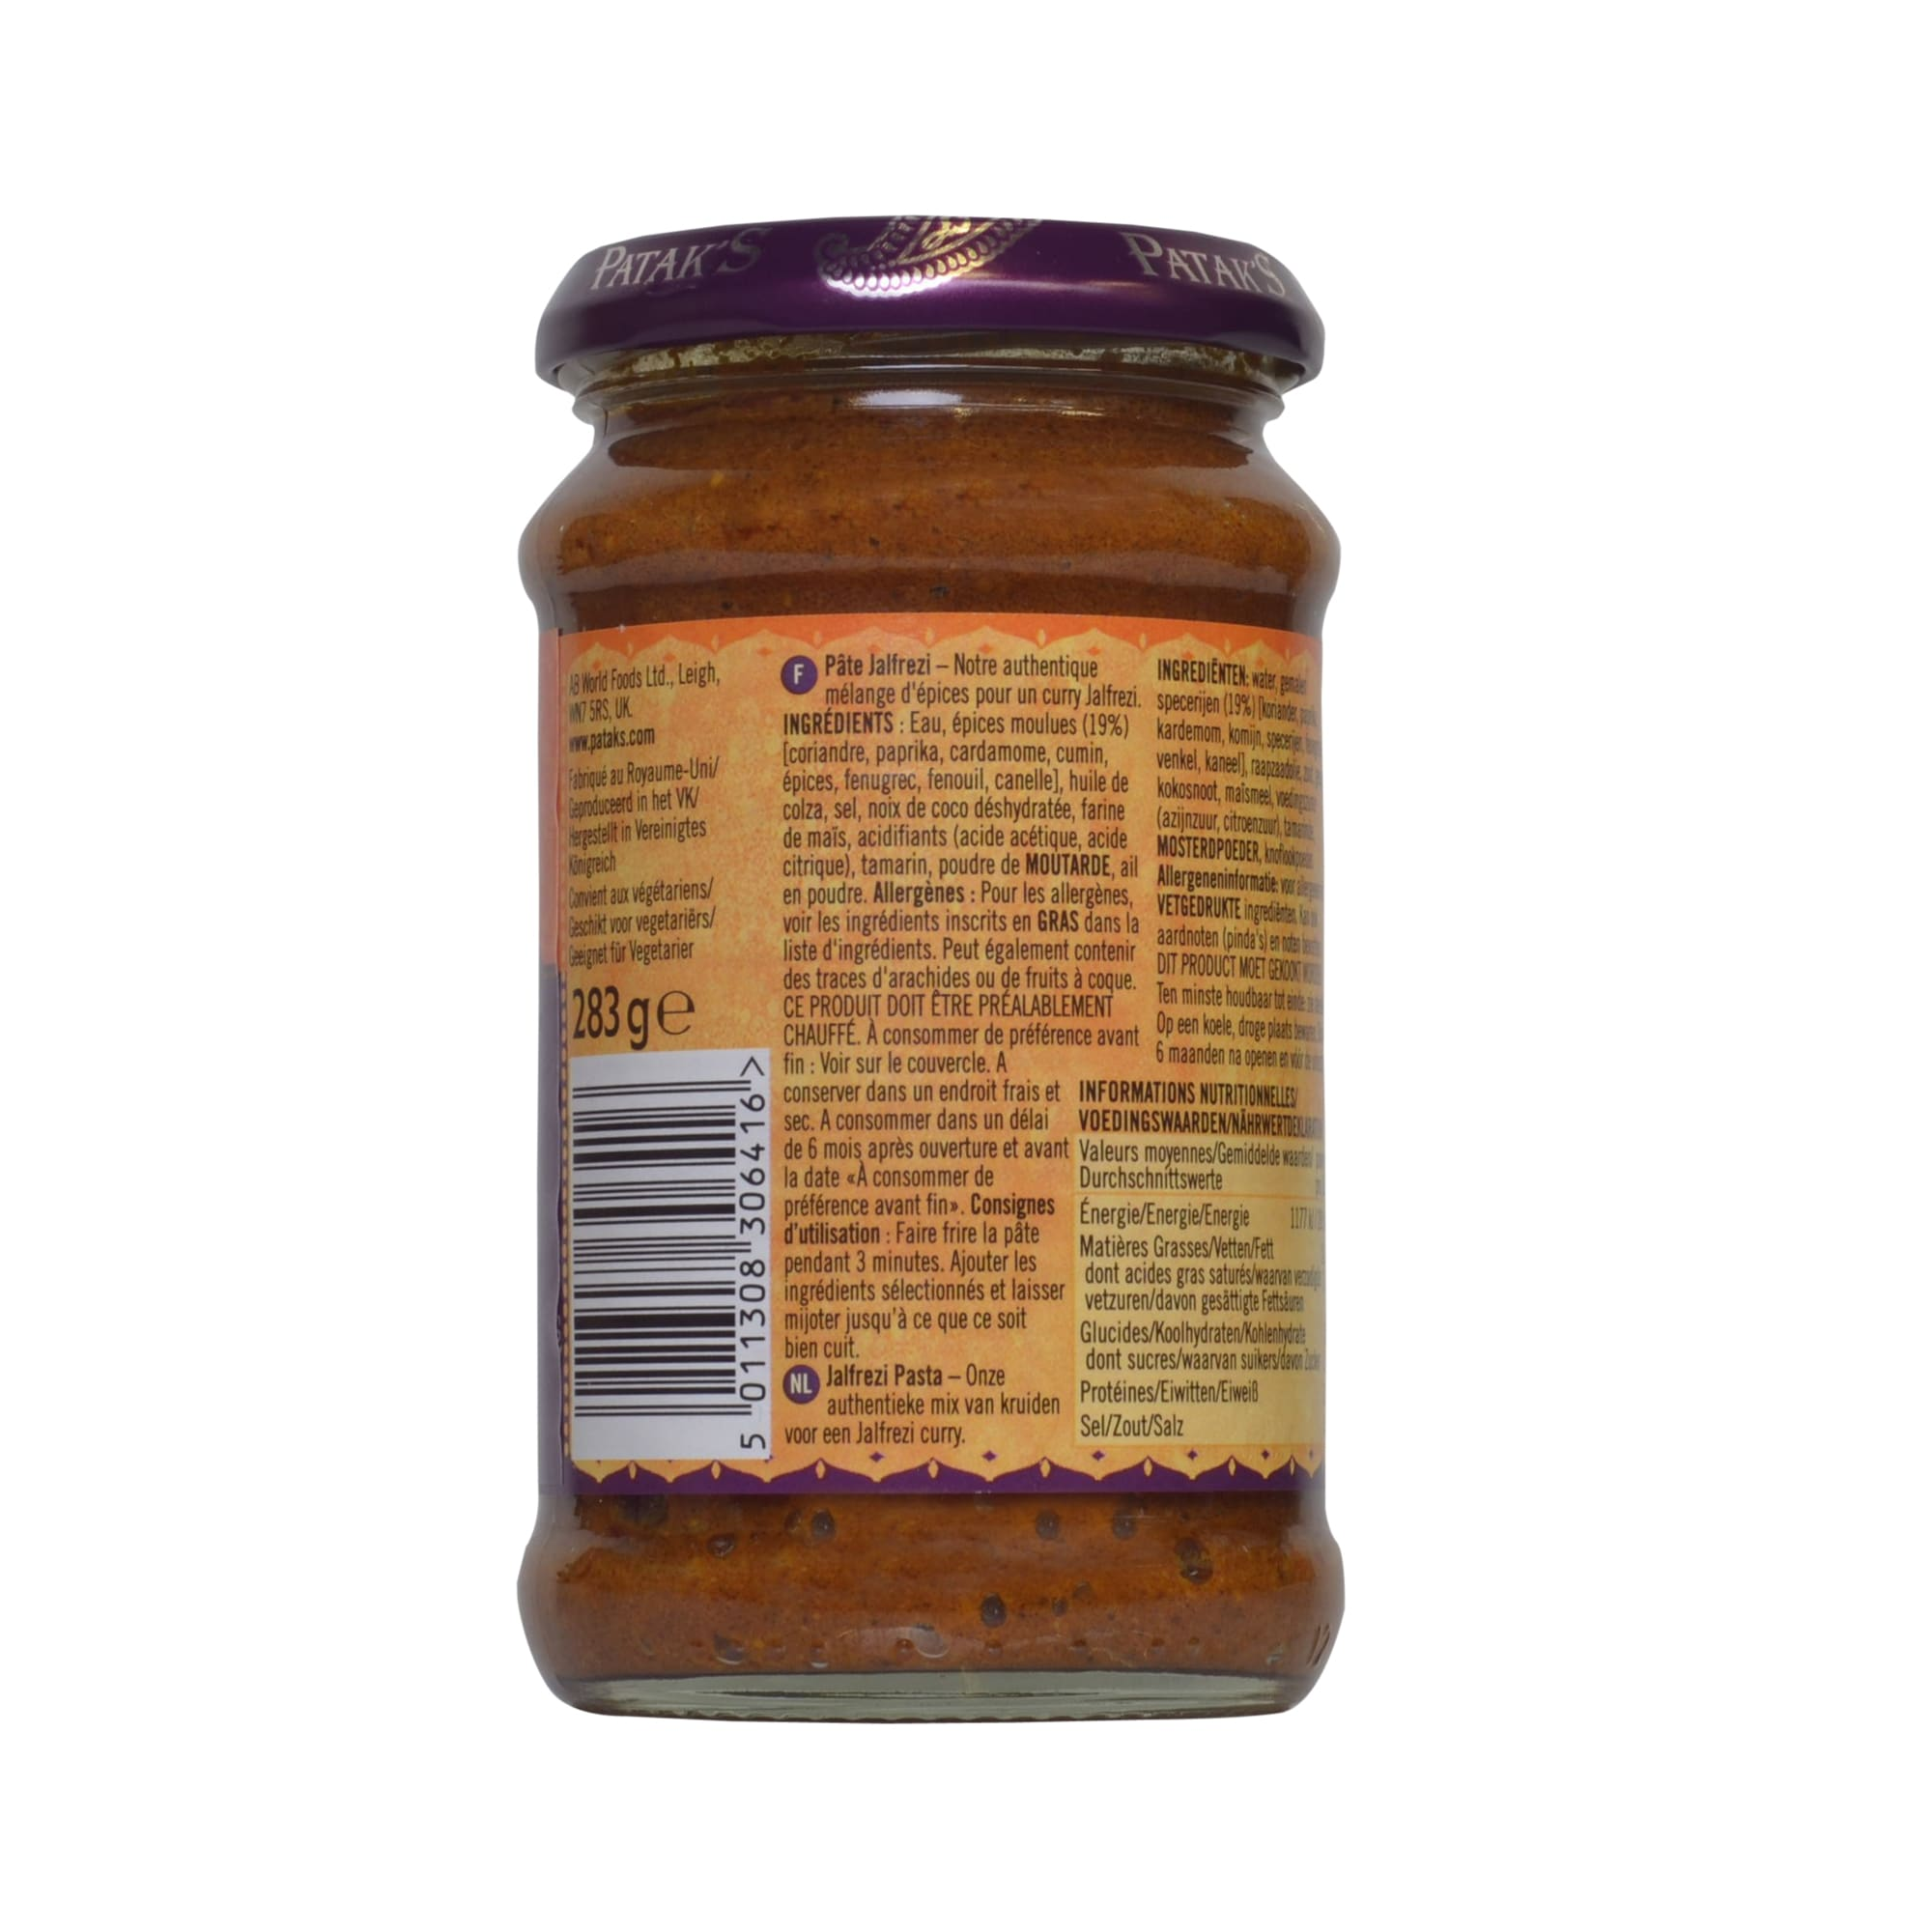 Patak's Jalfrezi Paste medium scharf 283g